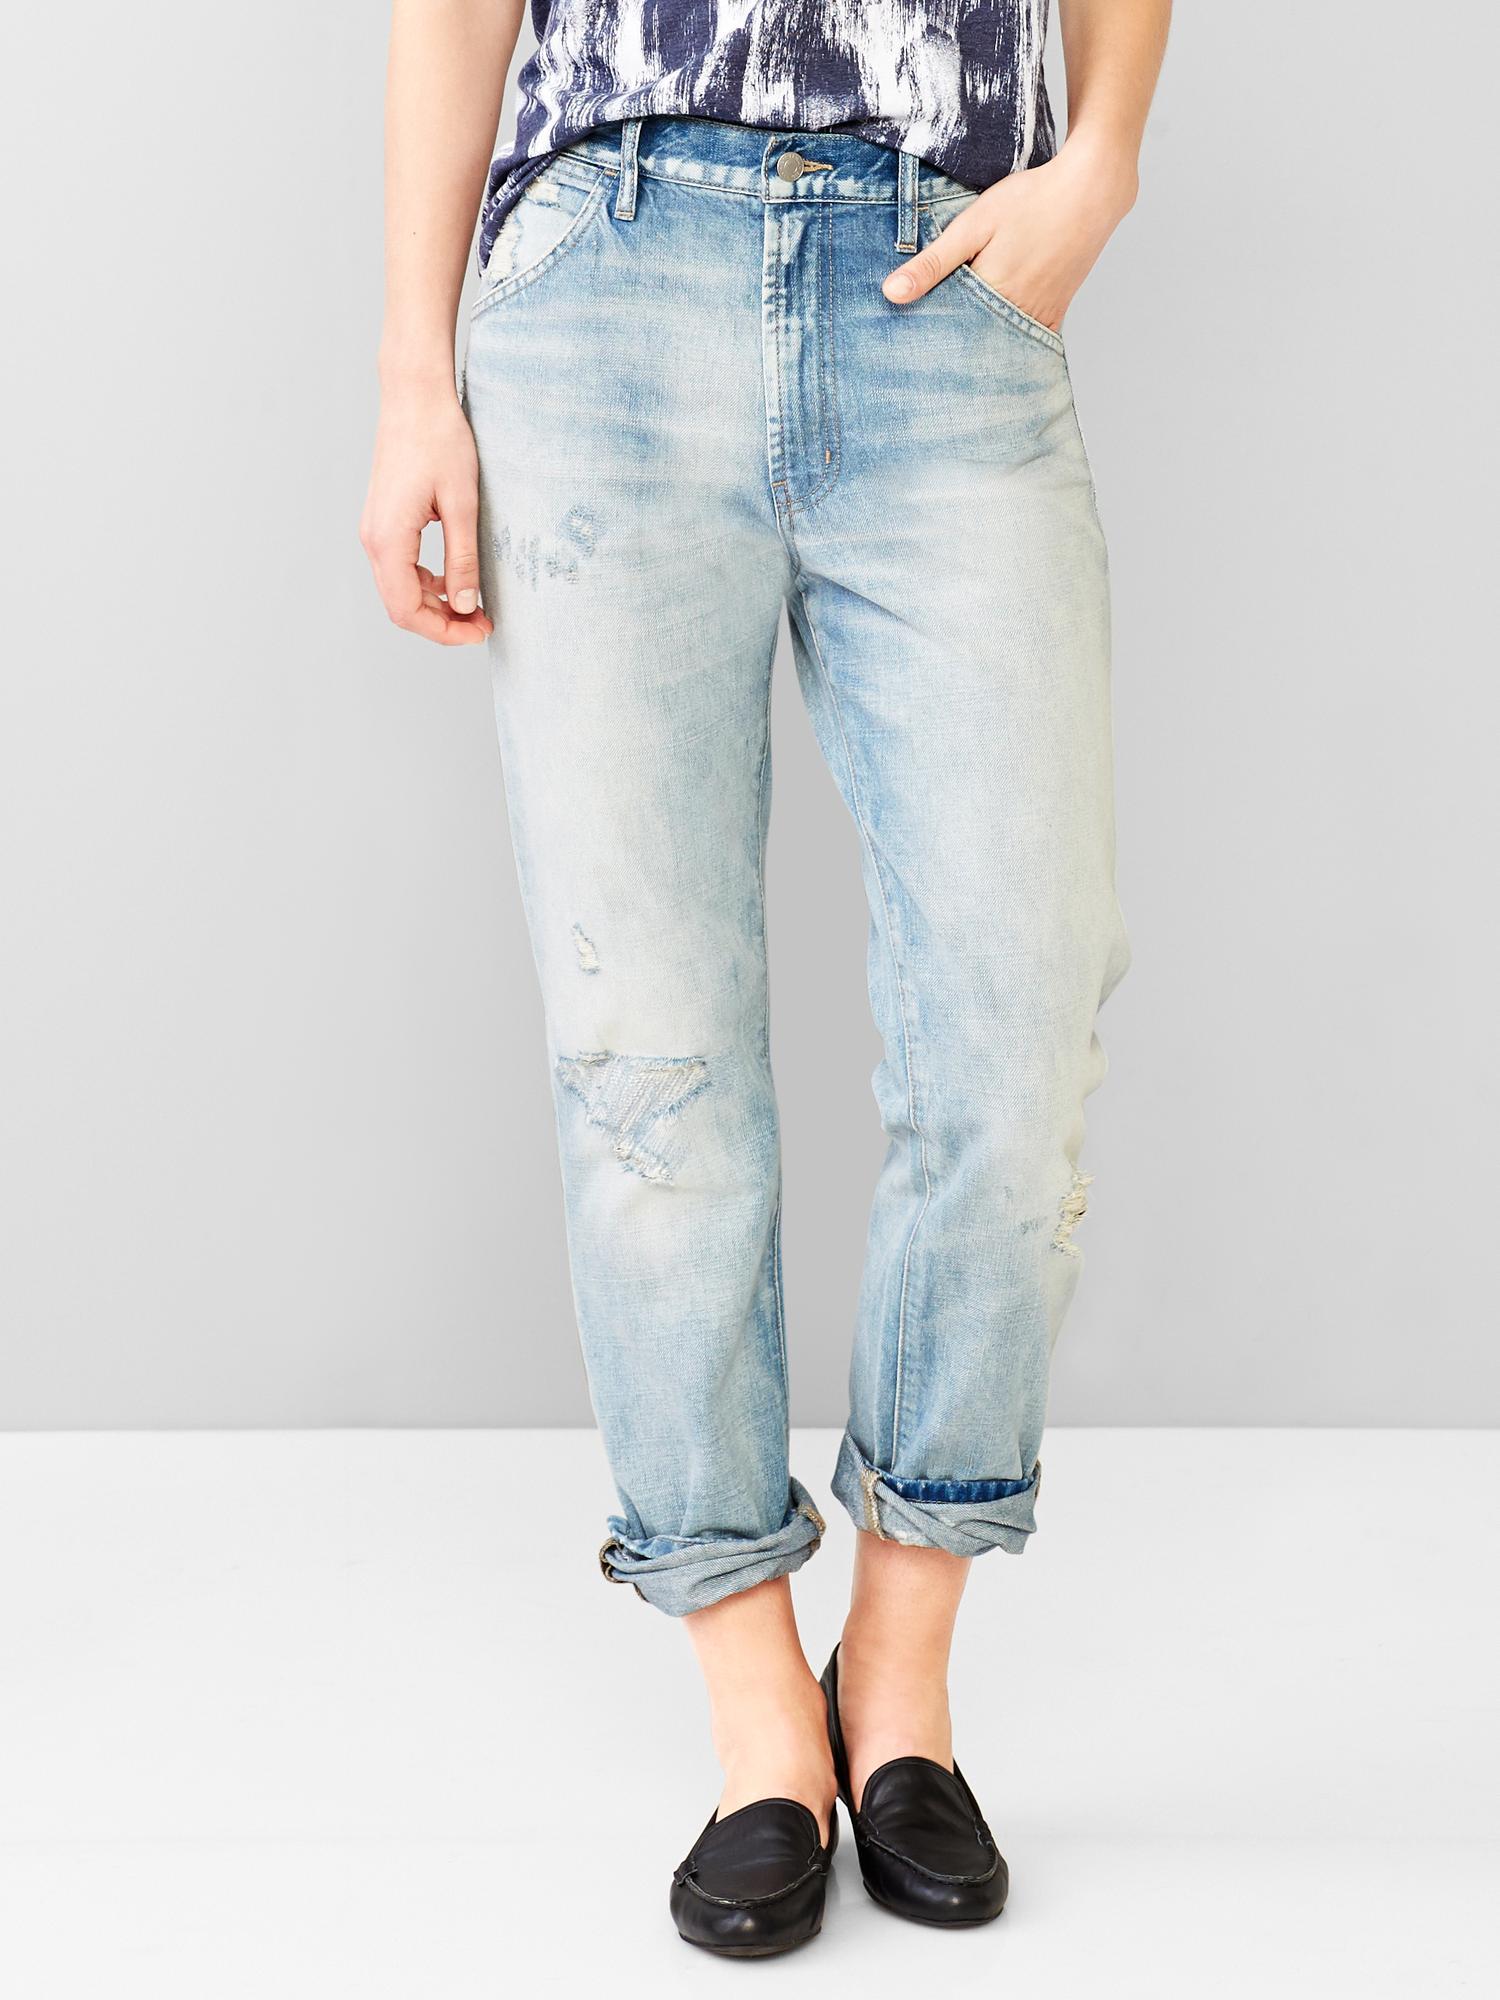 Gap 1969 Destructed Authentic Boyfriend Jeans in Blue (destroyed vintage) | Lyst